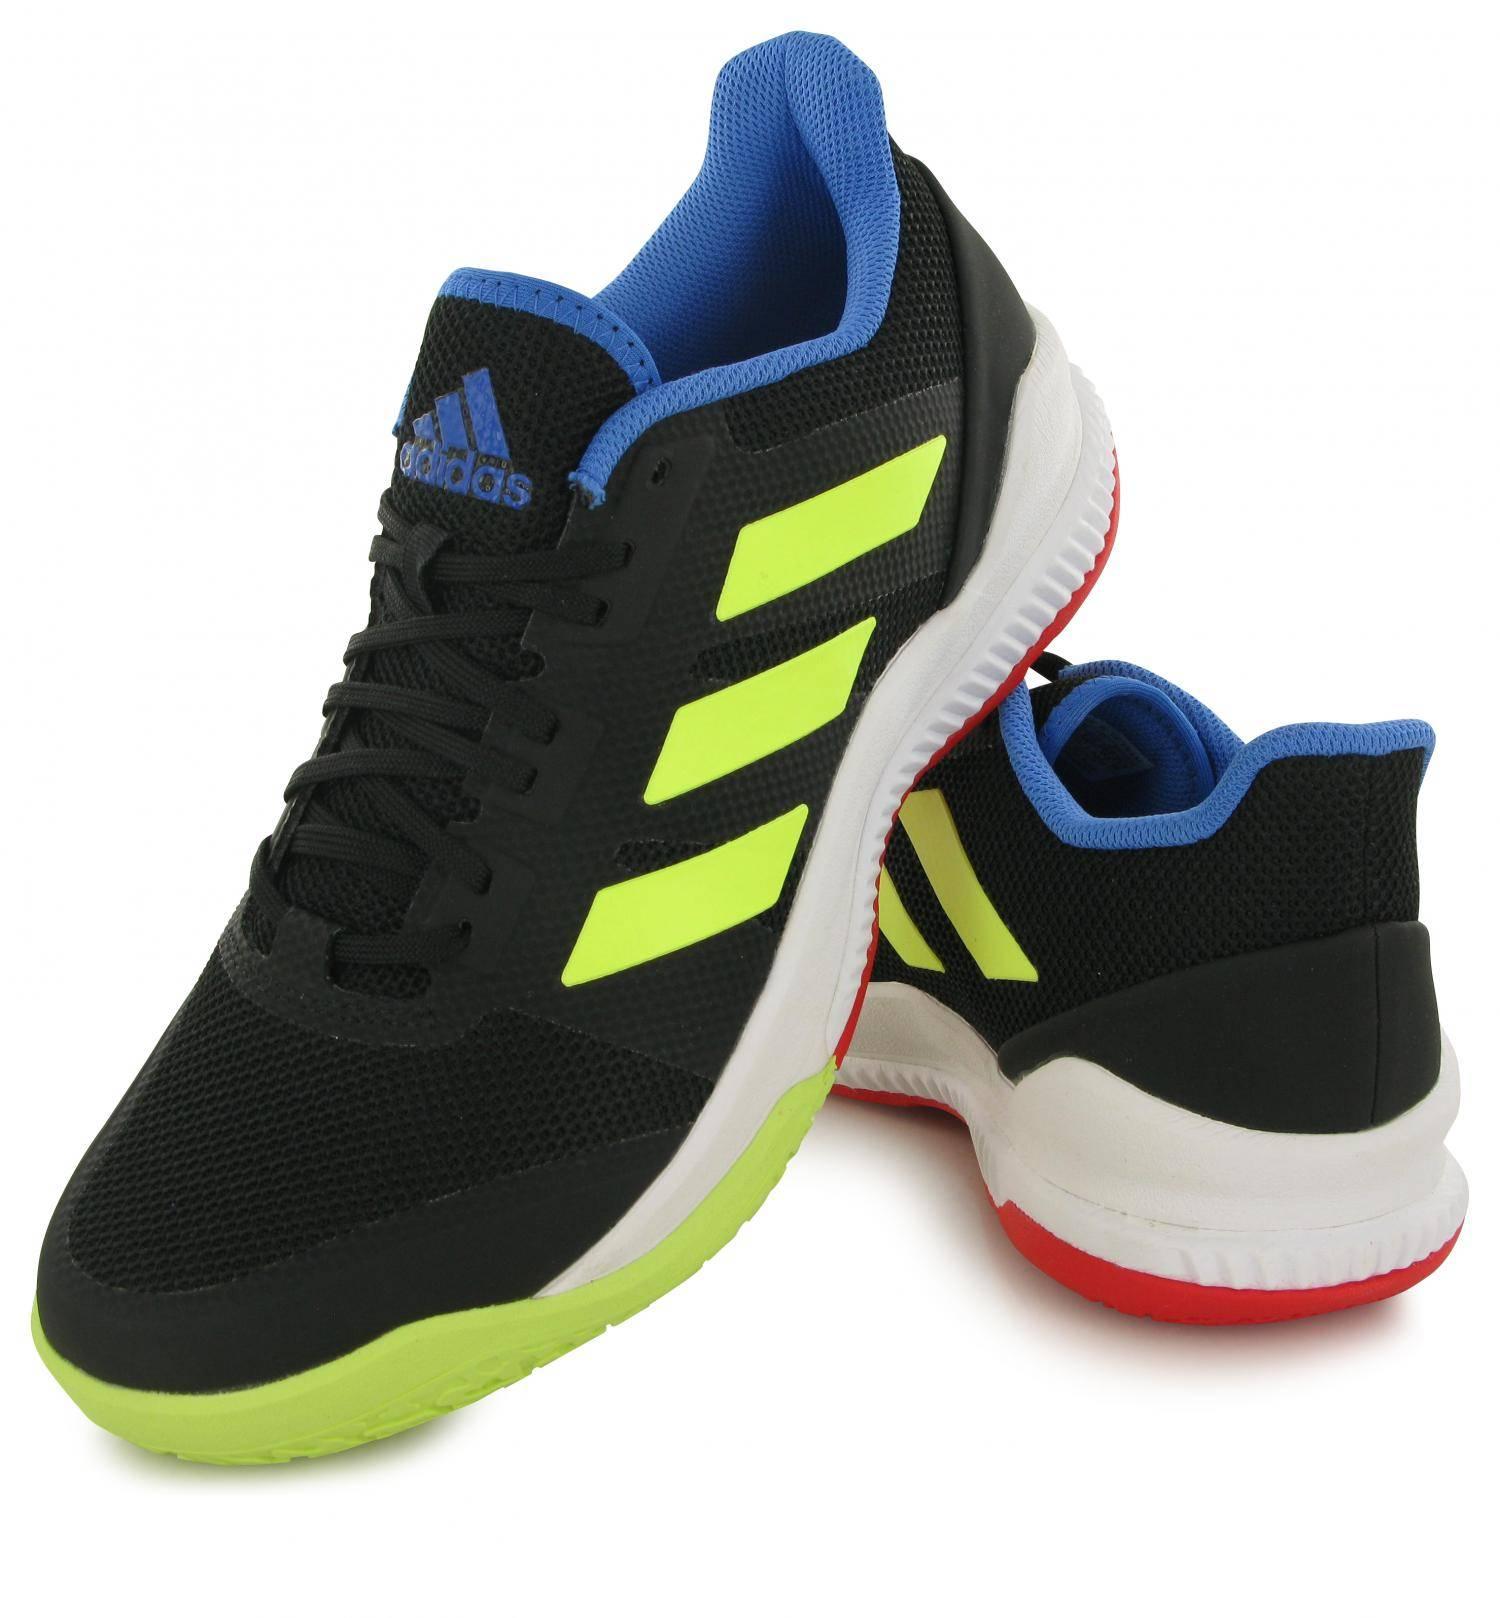 Adidas Stabil Bounce Noir Jaune